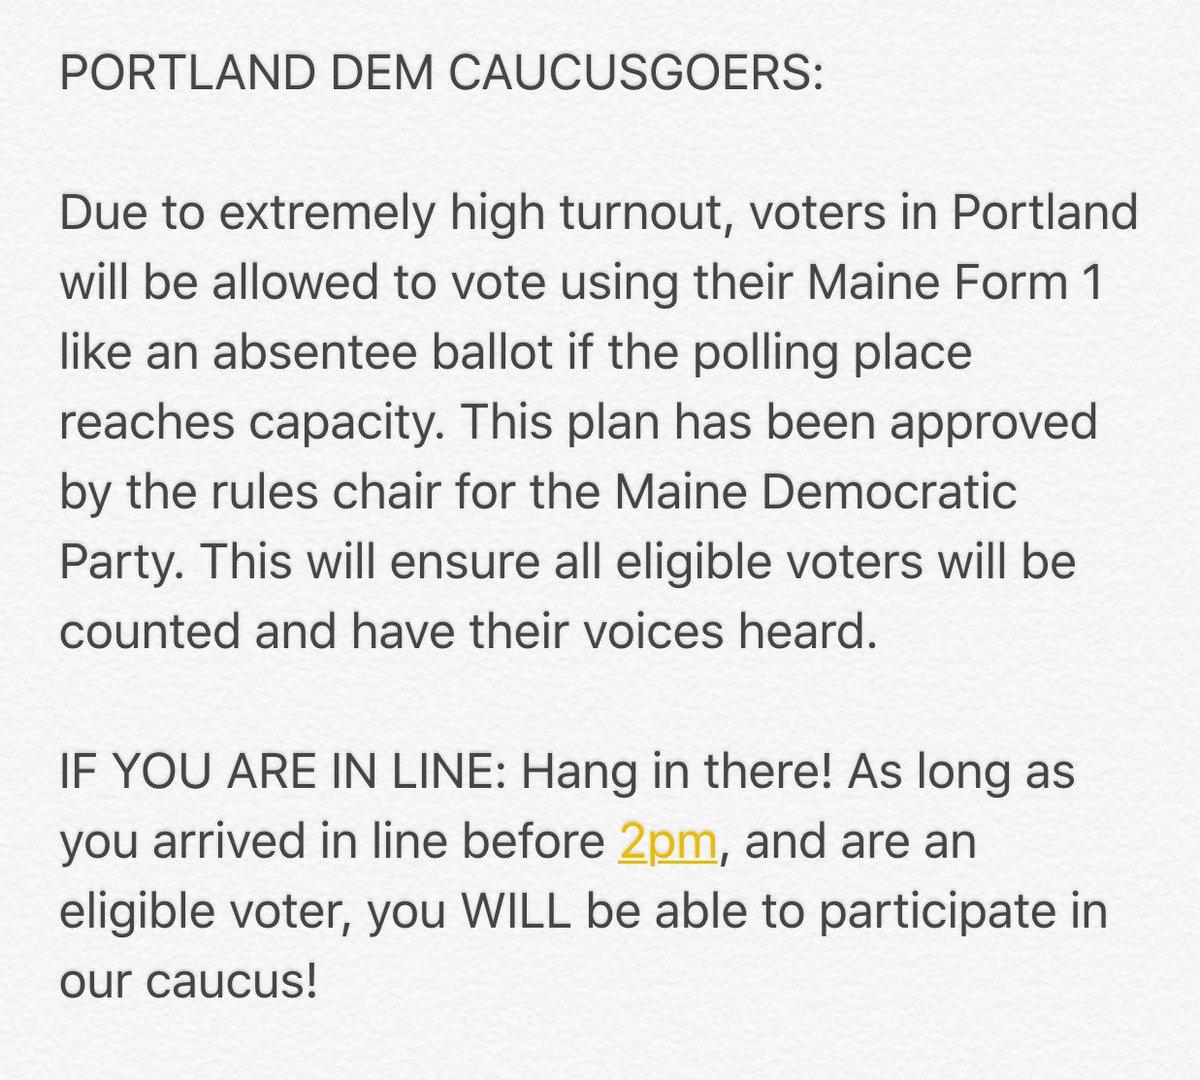 #mepolitics #PortlandMe Please spread the word. https://t.co/dNOSrGBMtv